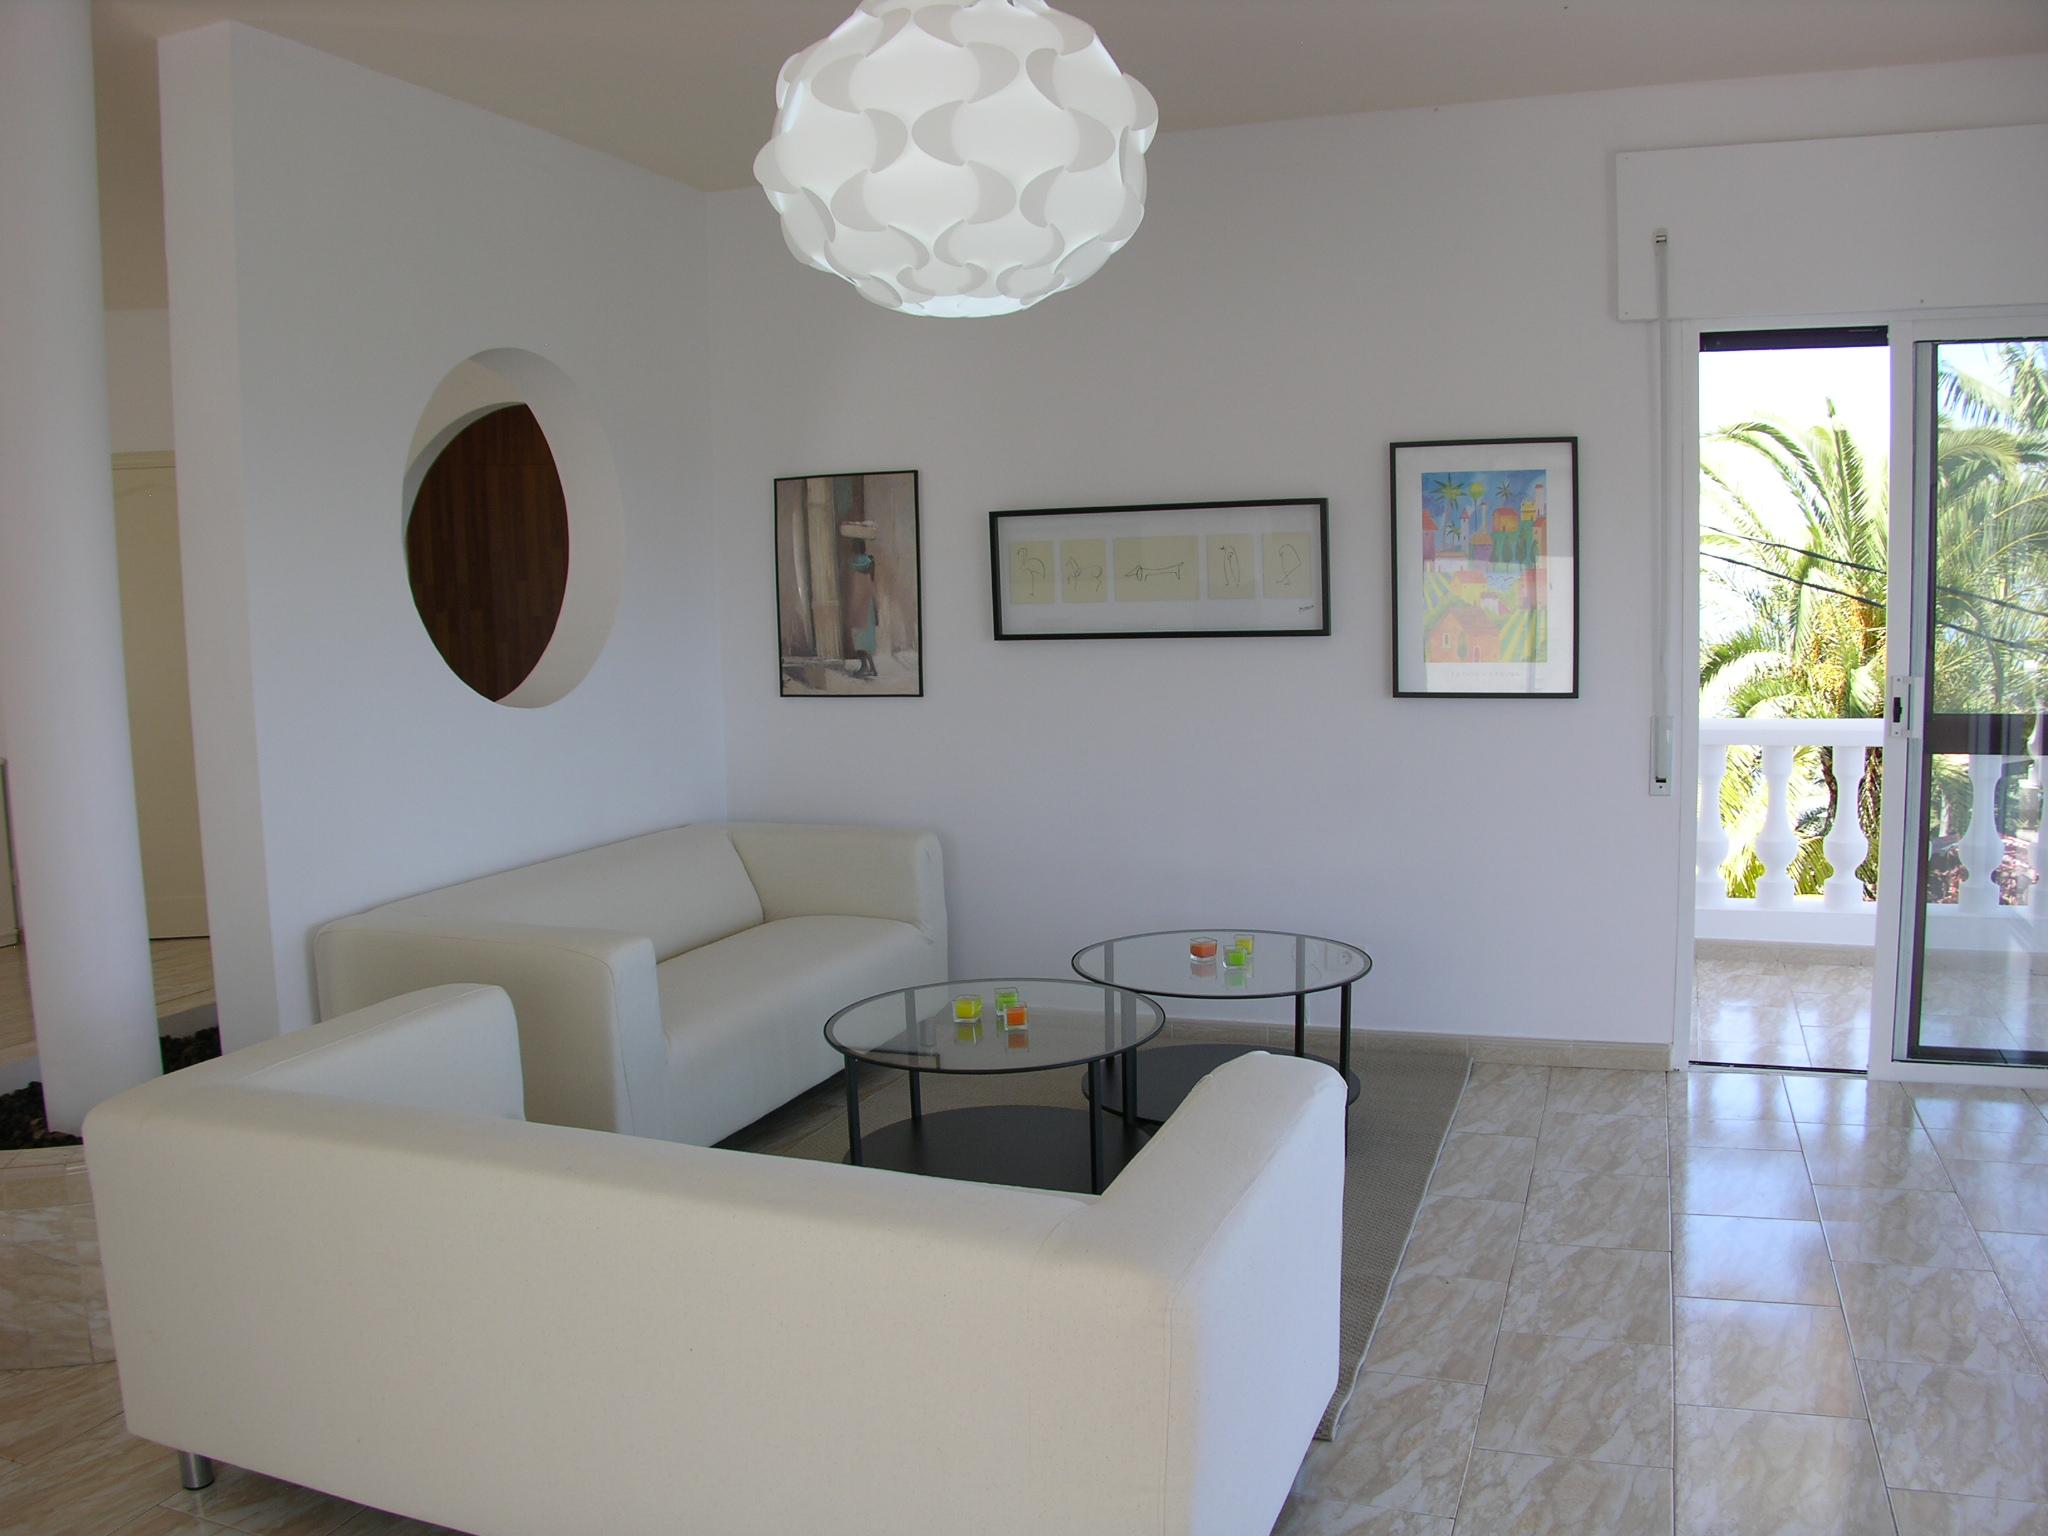 Maison de vacances Villa Vista La Quinta beheizbarer Pool kostenloses WLAN Grill (2124407), Santa Ursula, Ténérife, Iles Canaries, Espagne, image 43